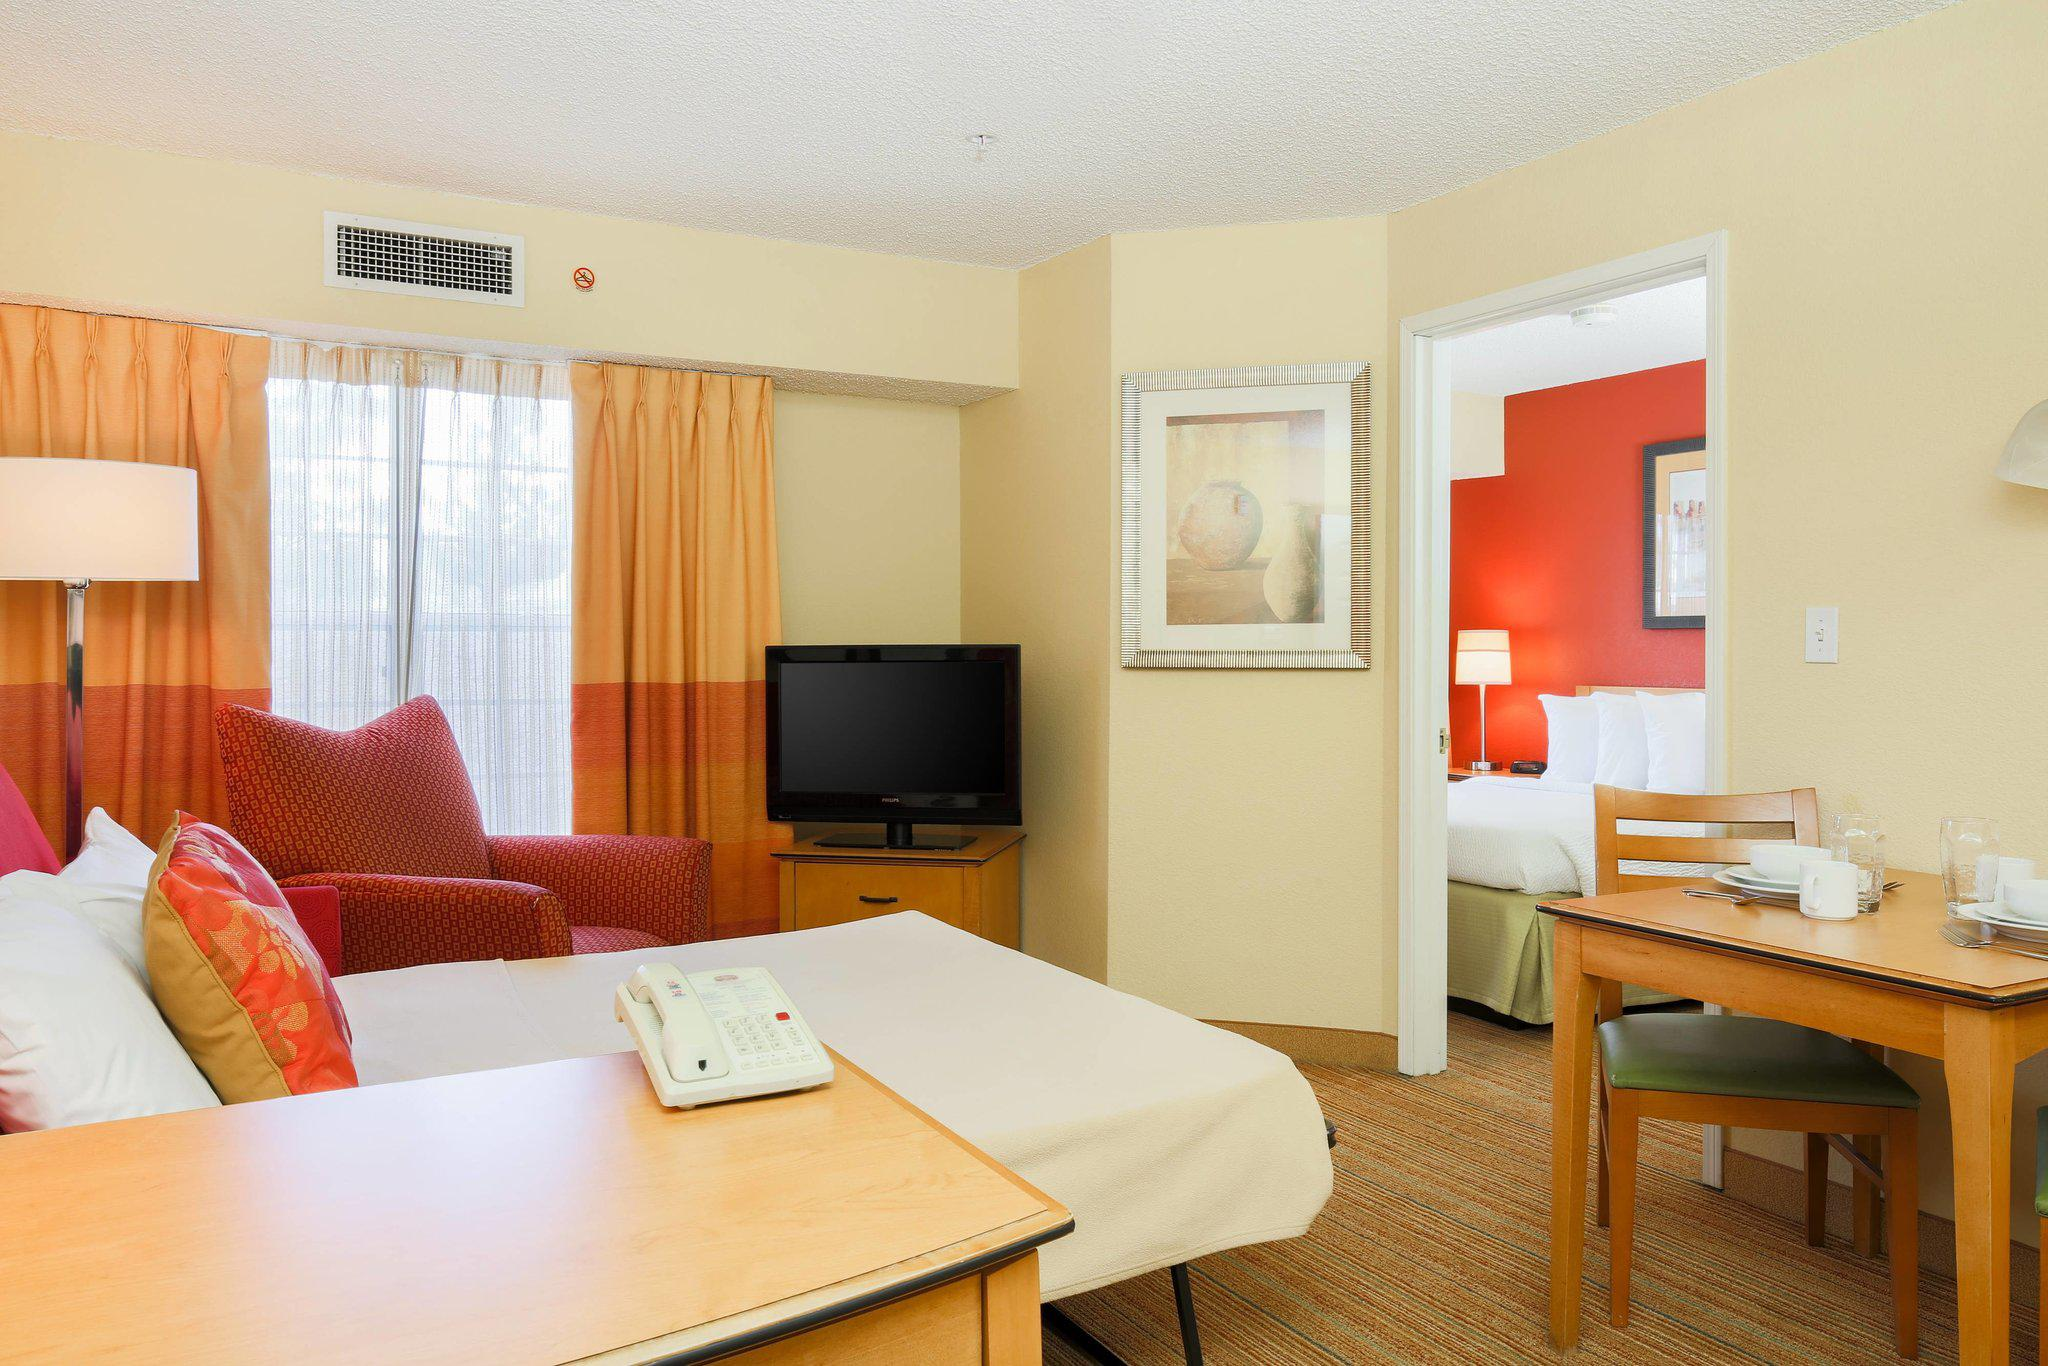 Residence Inn by Marriott Albuquerque North